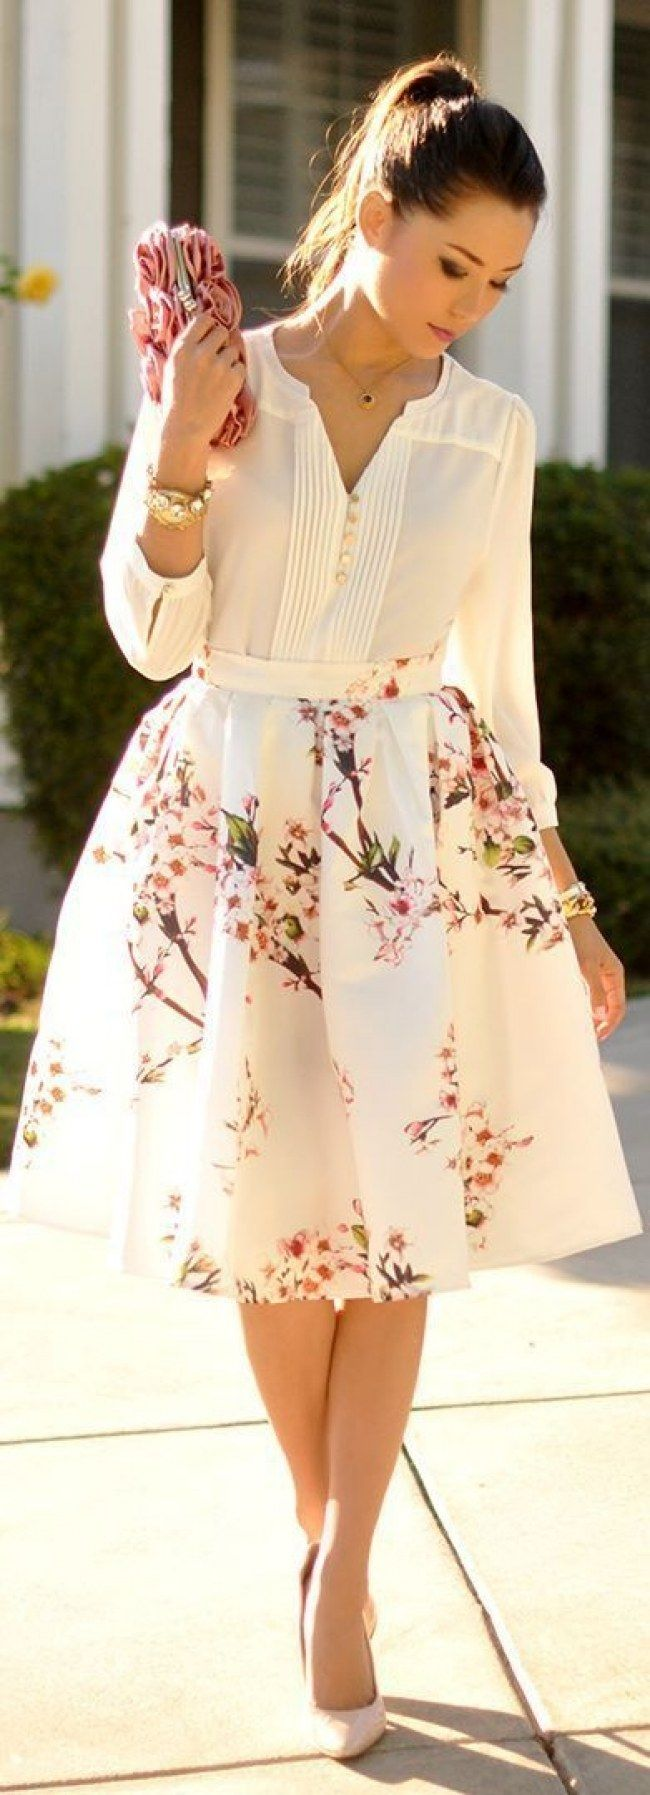 Midiröcke stylen: So kombiniert man die angesagten Röcke 2015